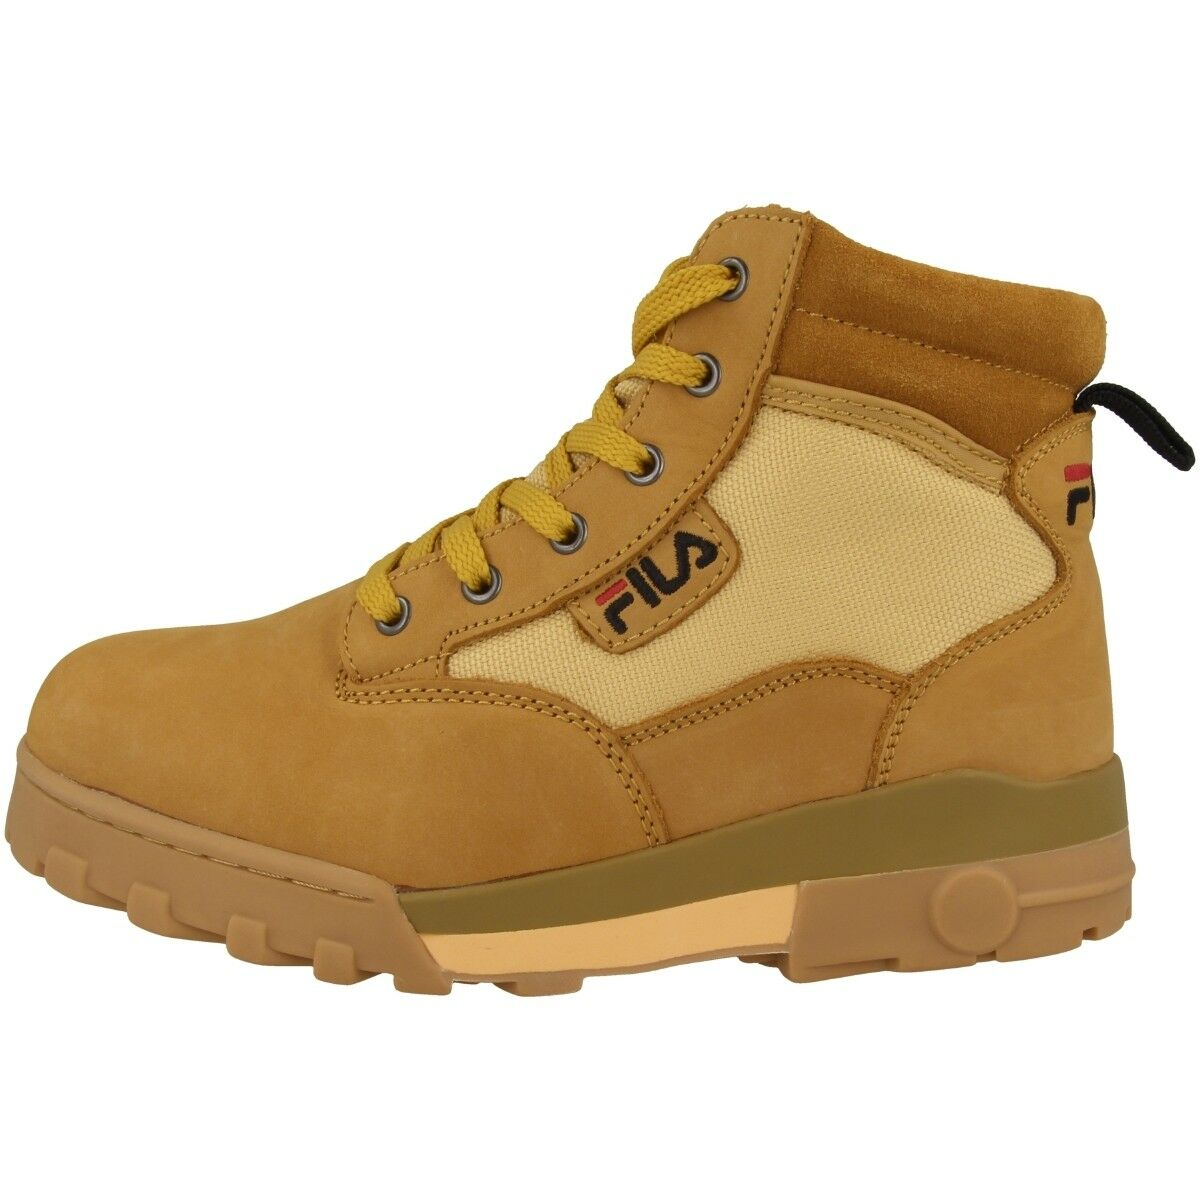 Fila Grunge Mid damen Outdoor Schuhe Stiefel Damen Stiefel 1010160.EDU Maverick